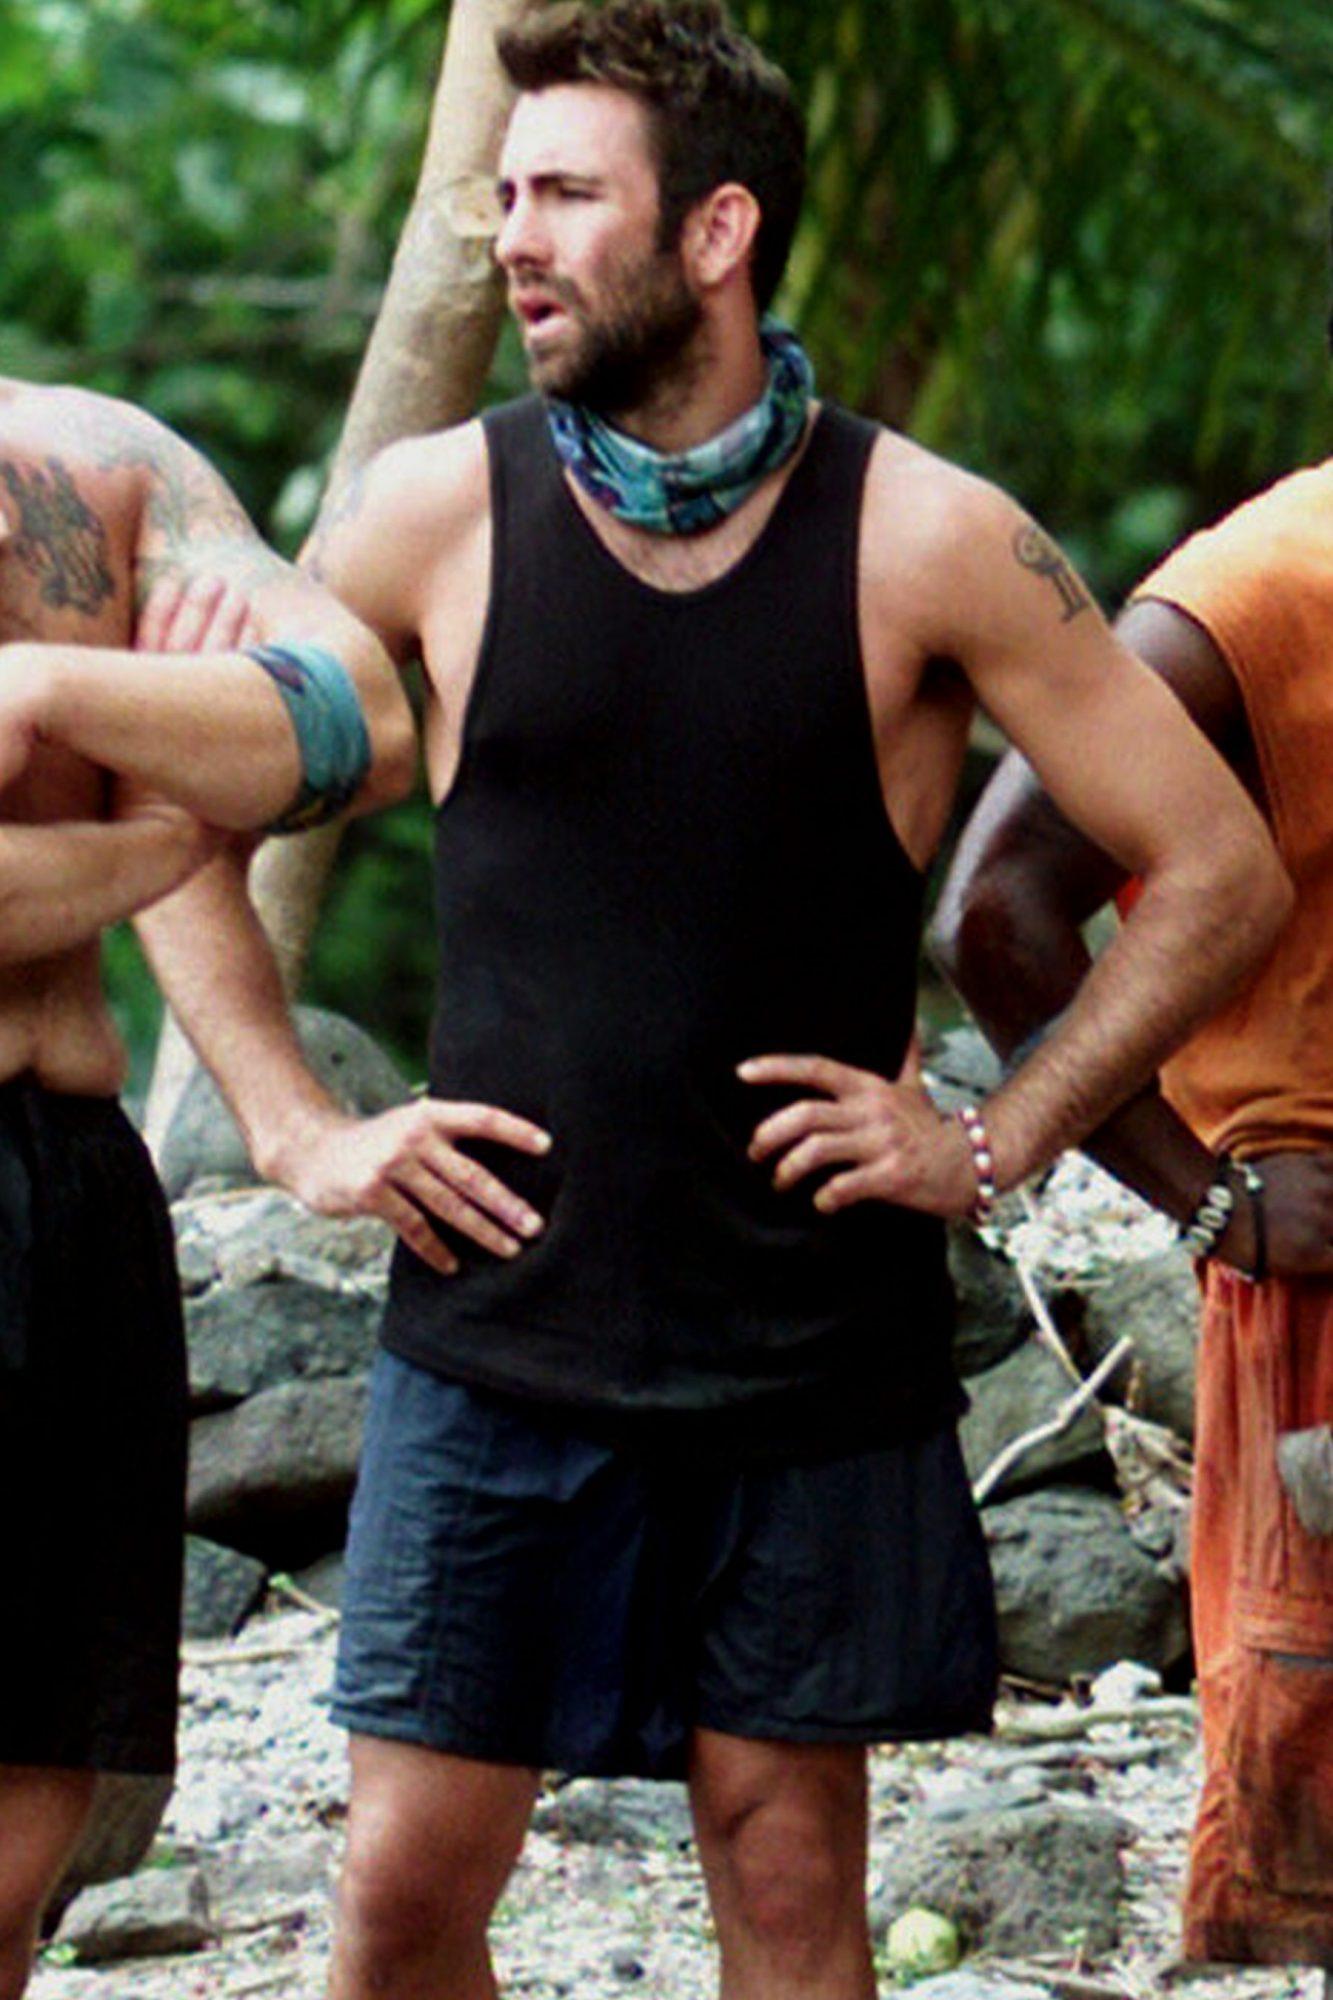 Cast Pepares For A Reward Challenge On 'Survivor: Marquesas'